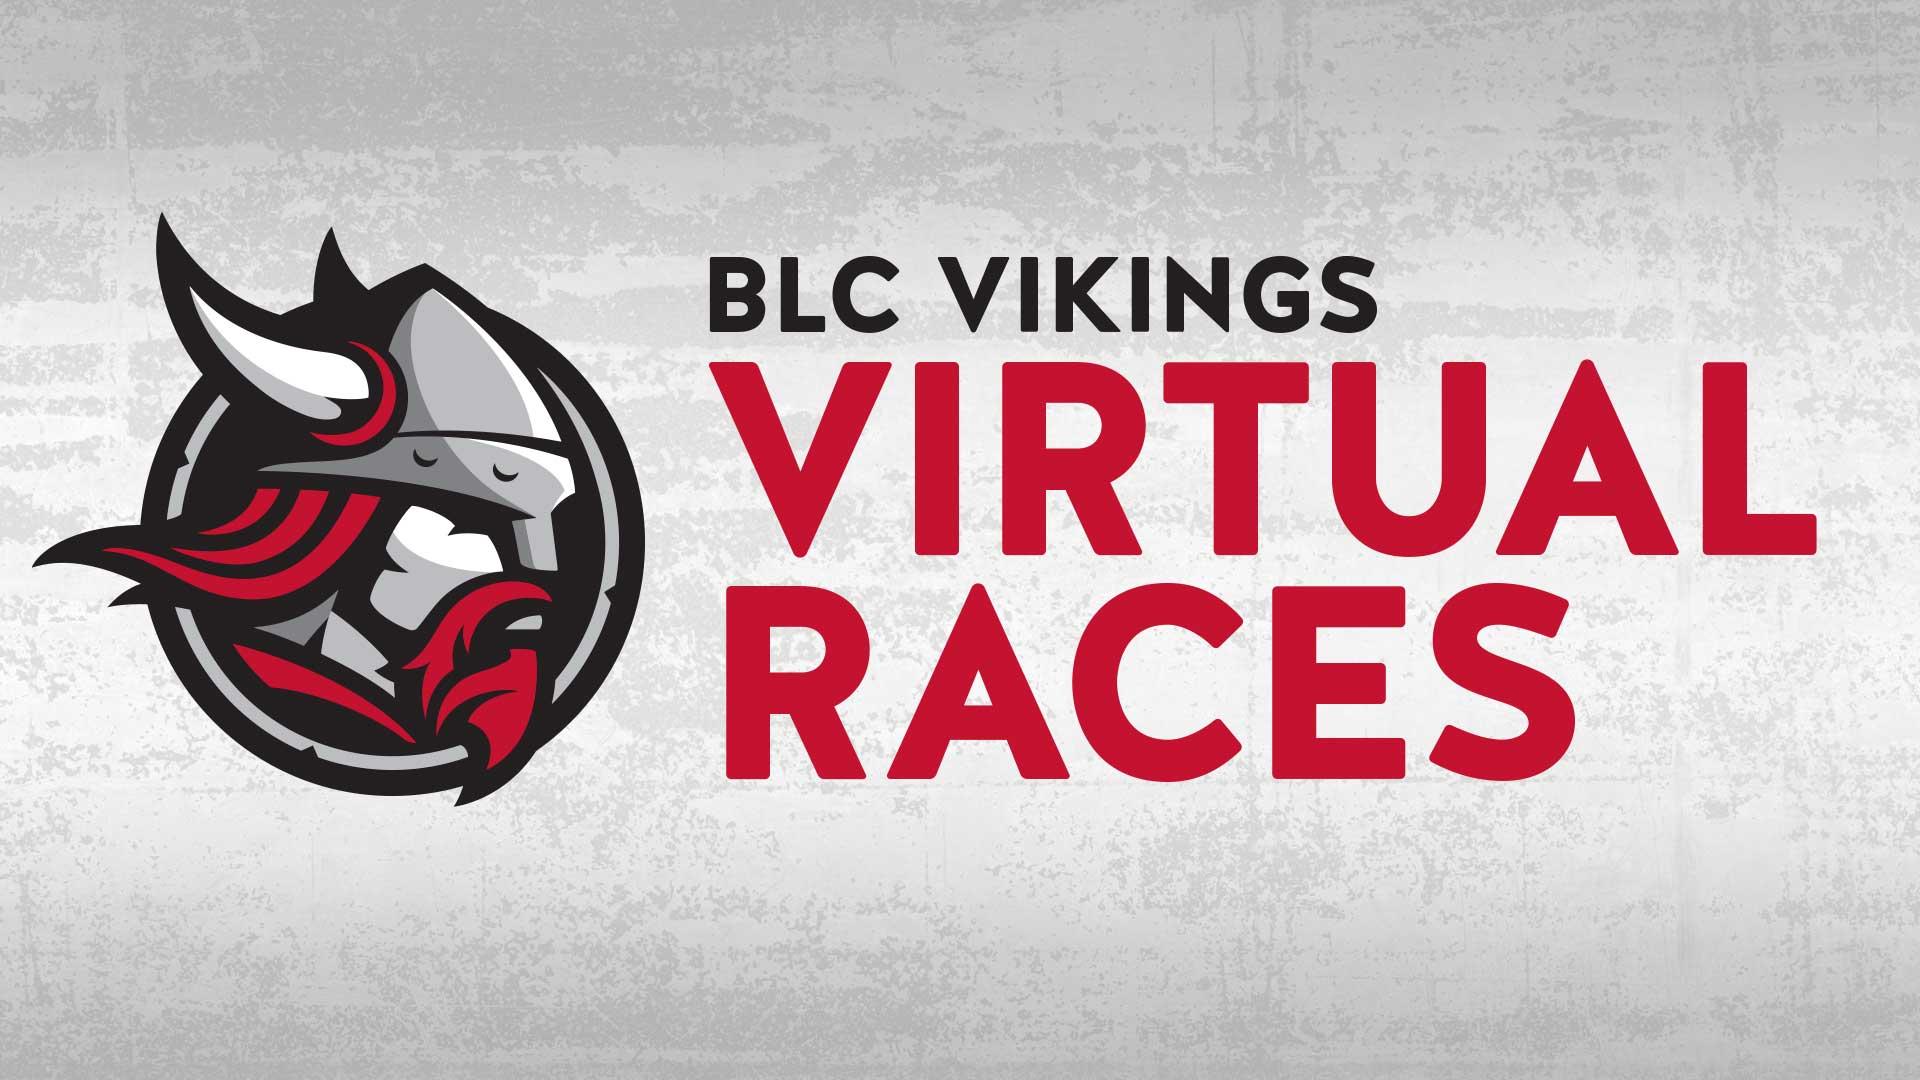 BLC Vikings Virtual Races